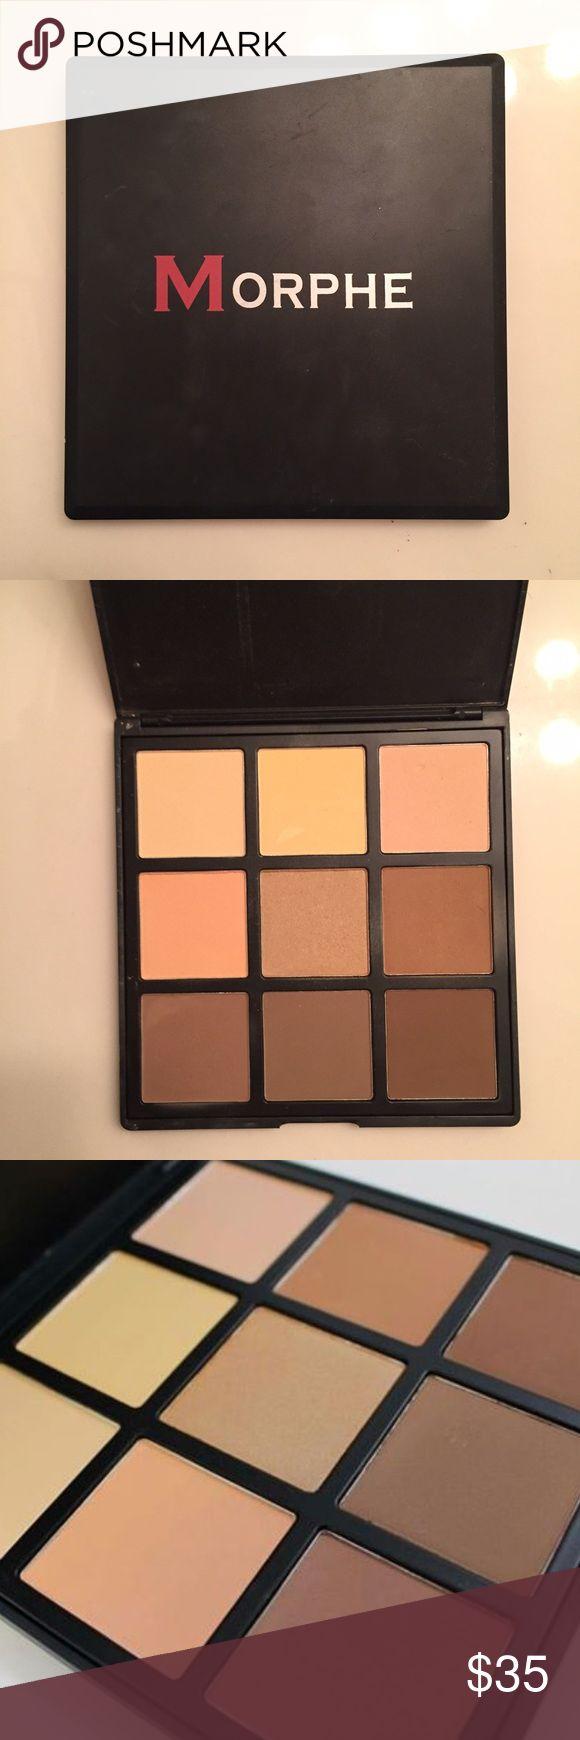 NWOT MORPHE CONTOUR PALETTE NWOT MORPHE Contour Palette that works for any skin tone Morphe Makeup Foundation